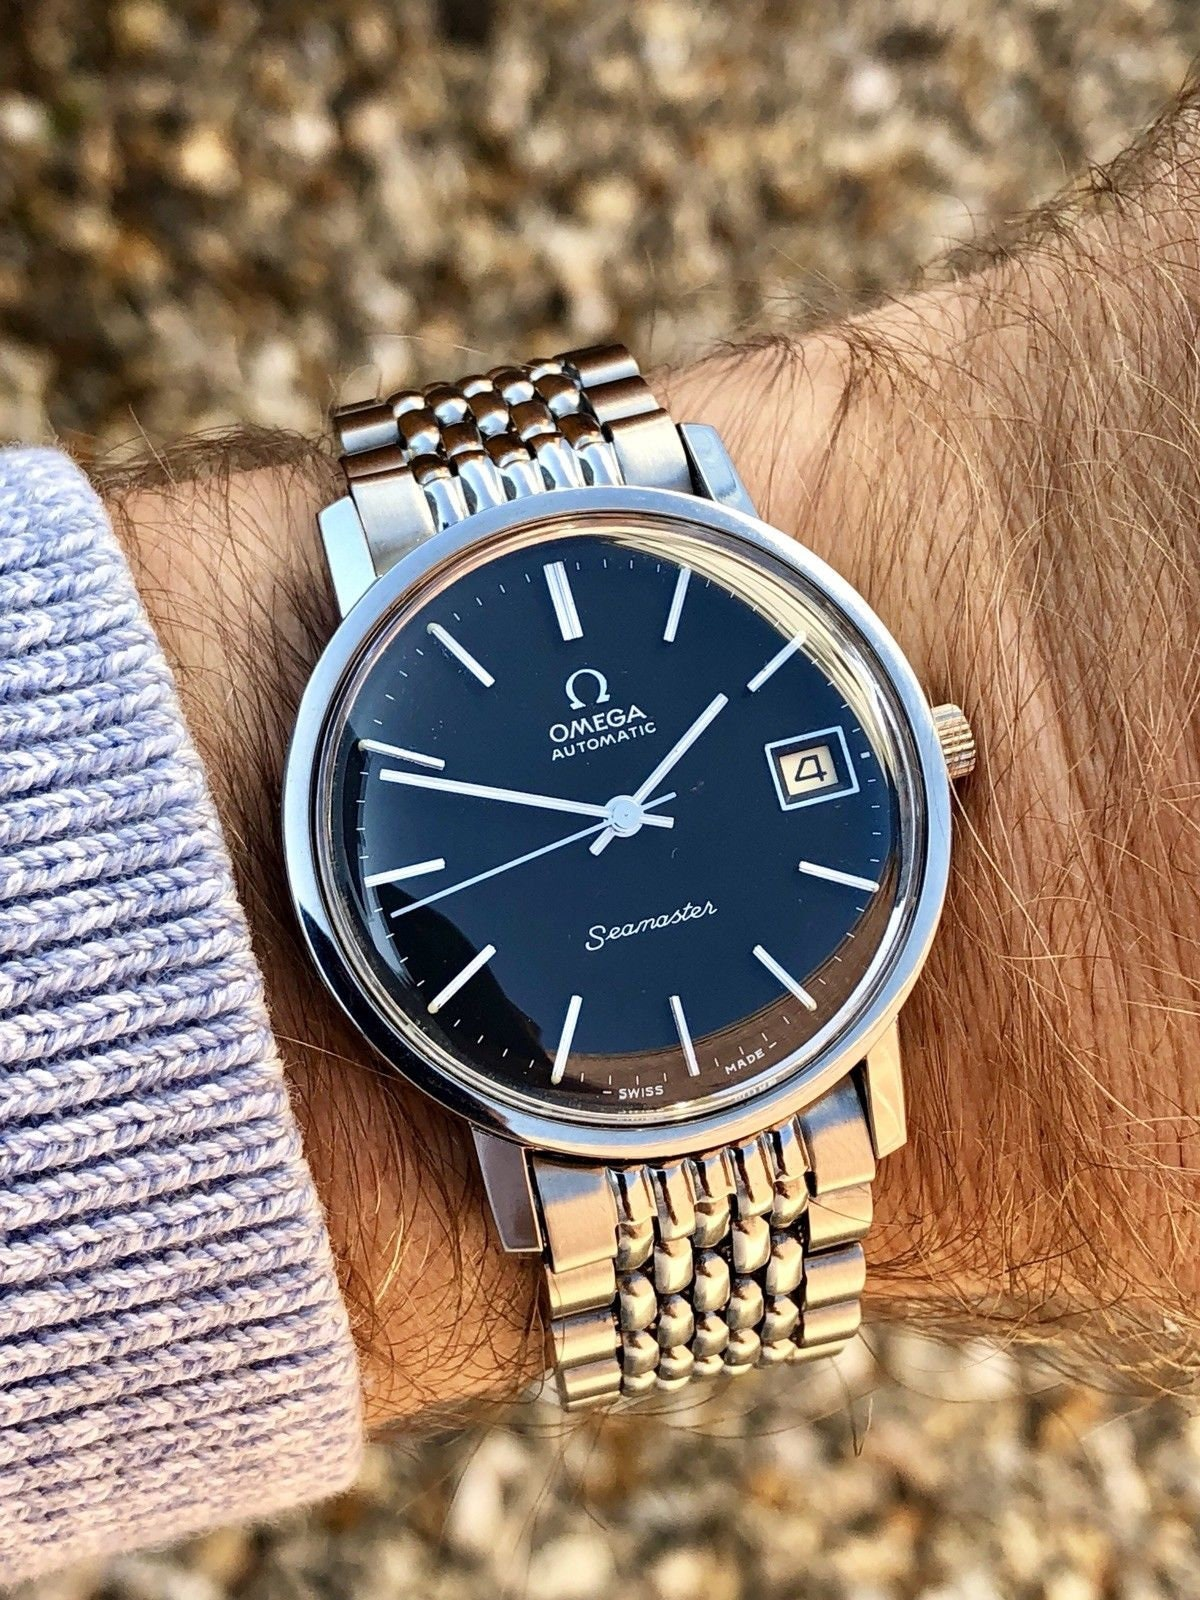 Omega Seamaster CAL 1012 Black Dial 1970s vintage watch